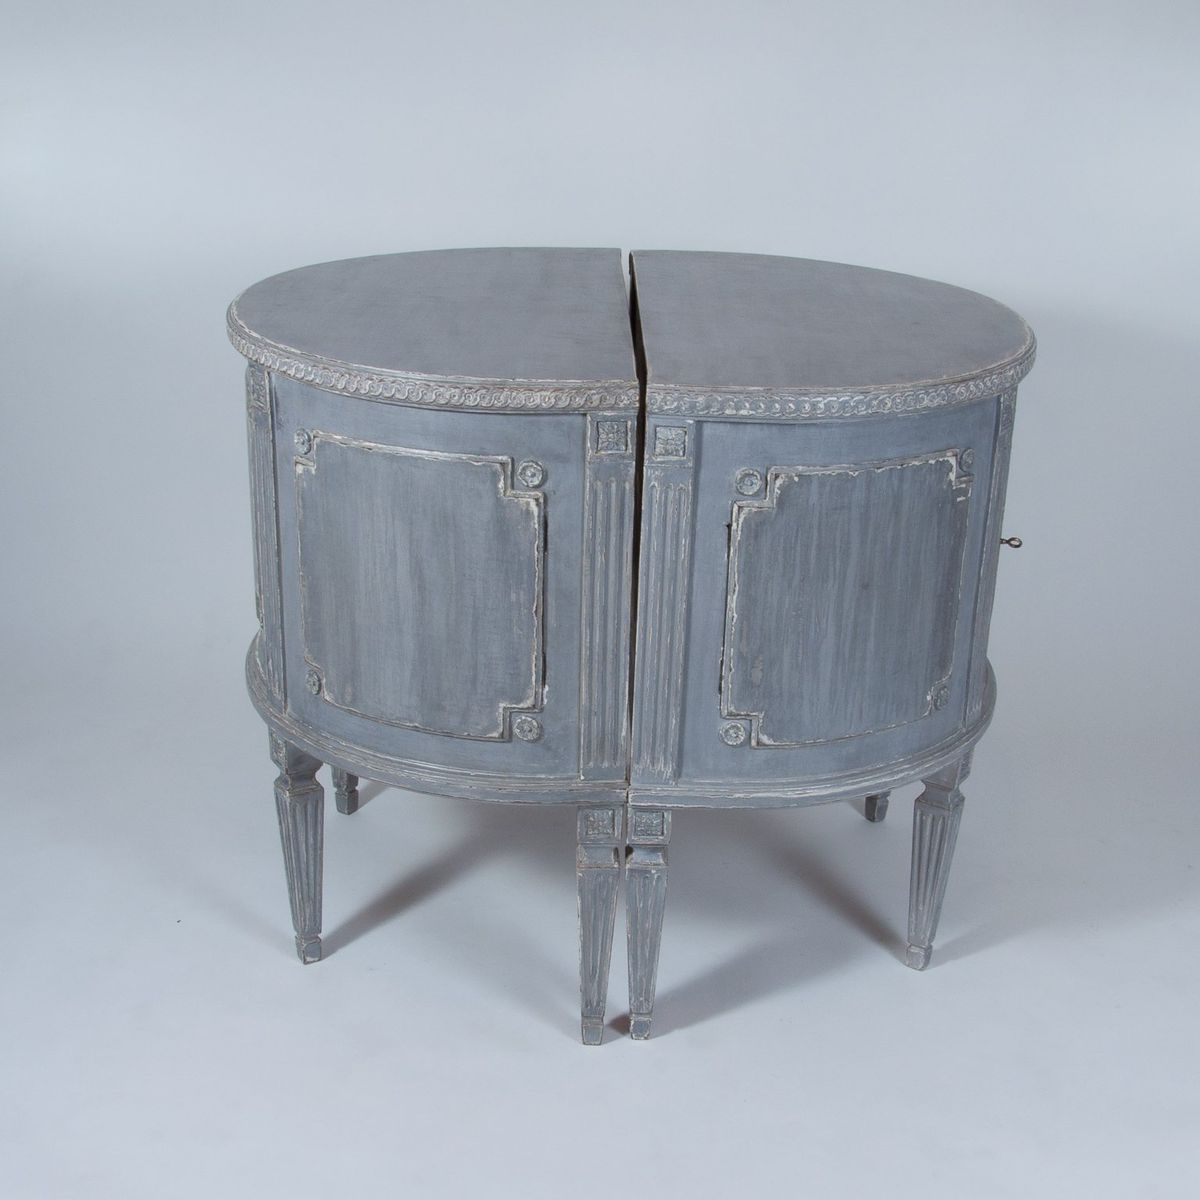 Antique Swedish Furniture For Sale - Antique Swedish Furniture For Sale Antique Furniture